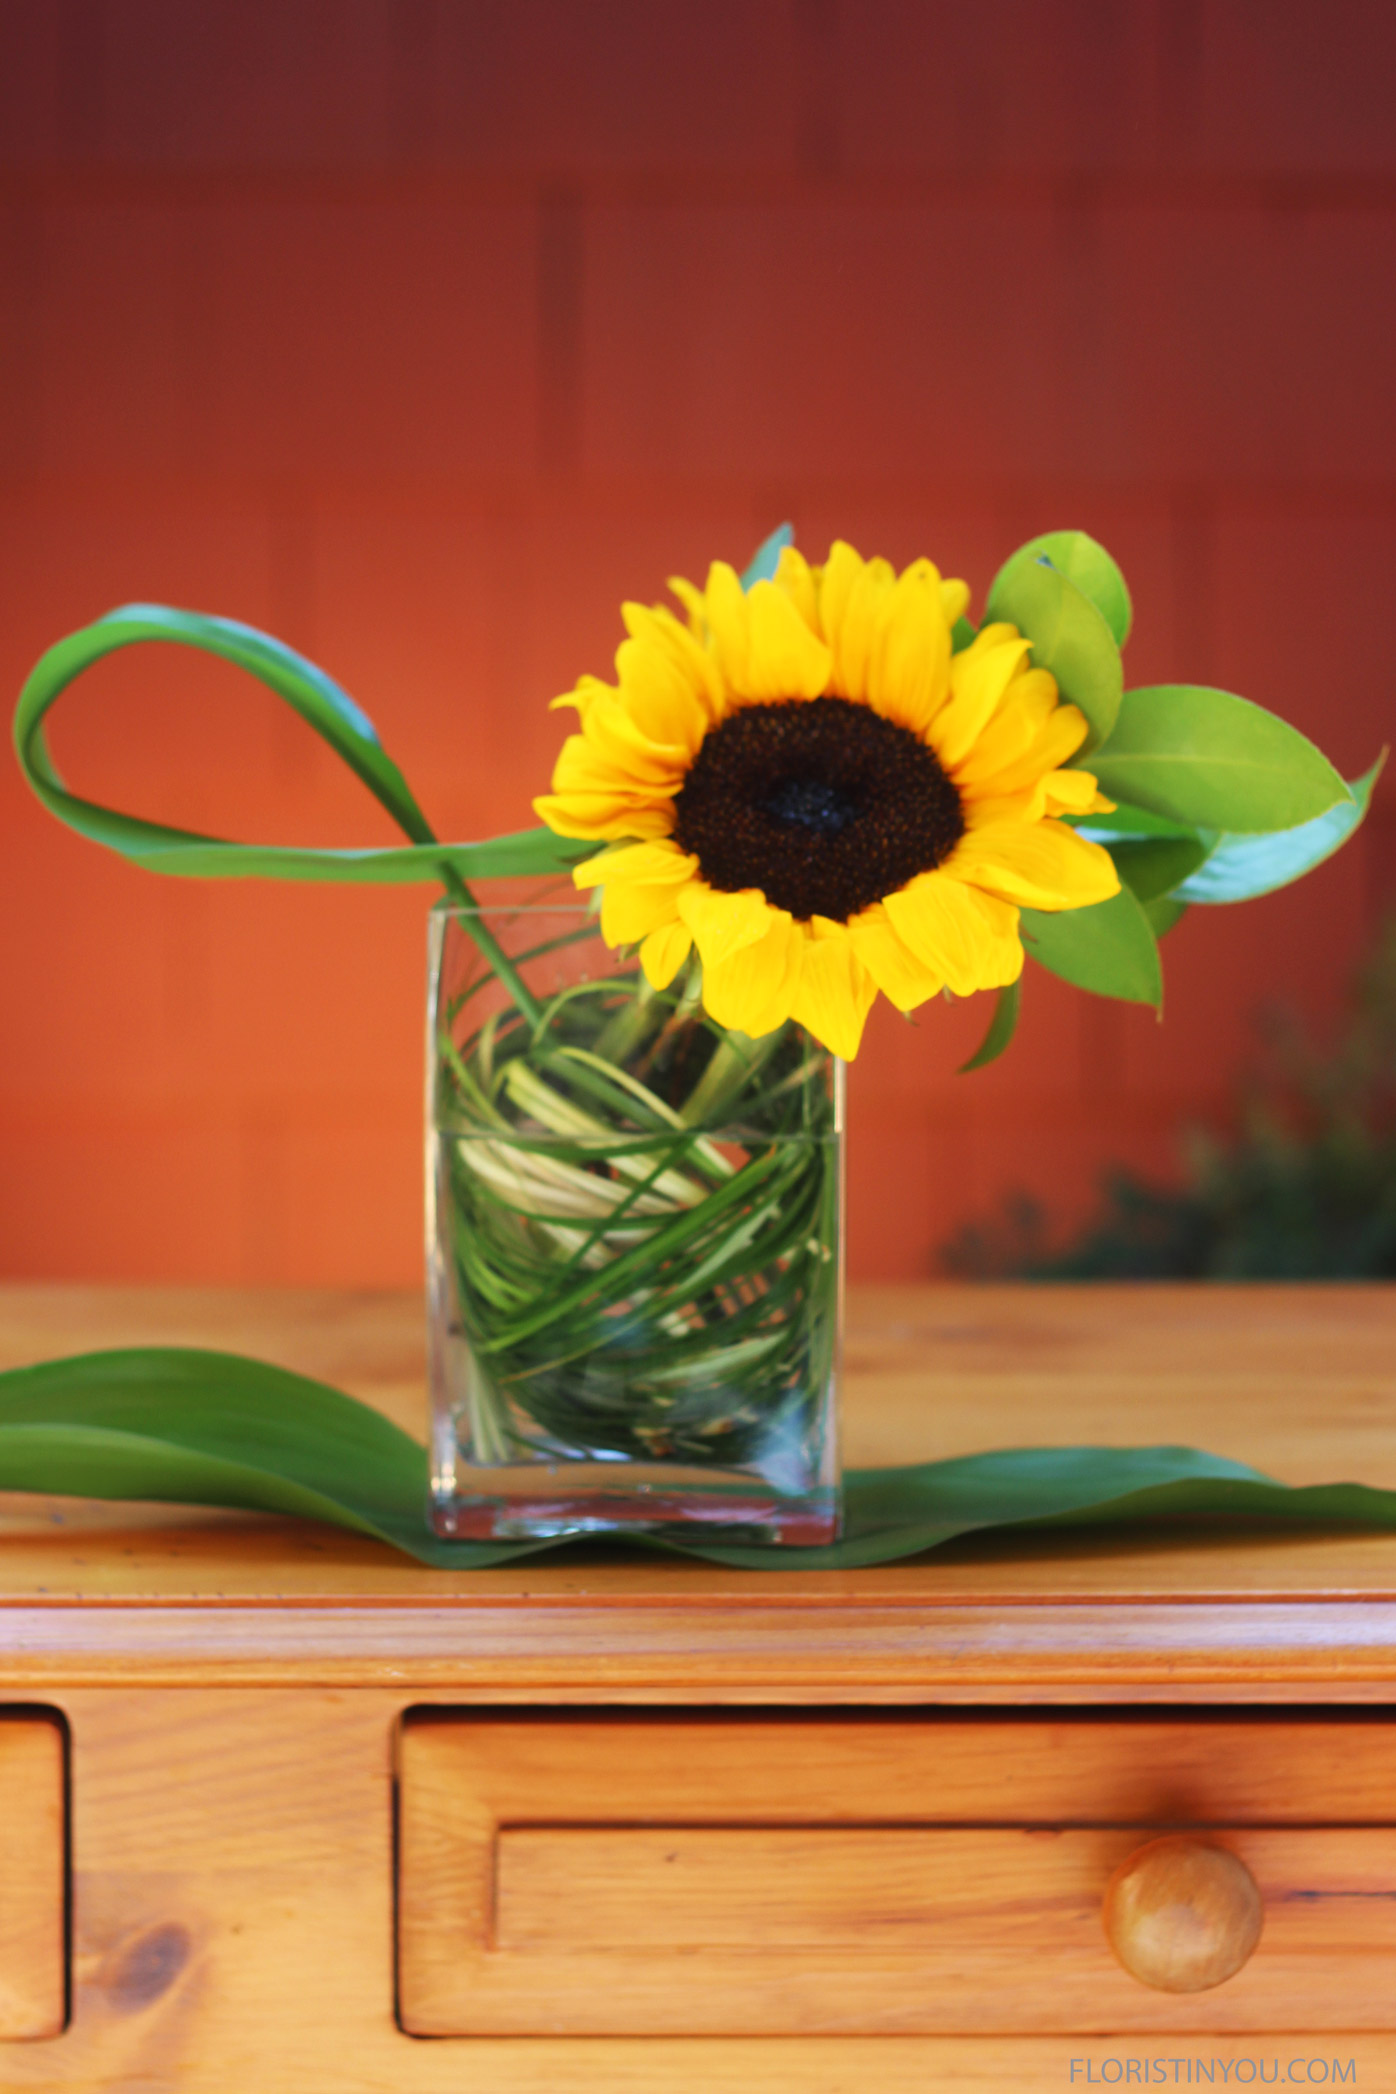 Sunflowers in a Rectangular Vase